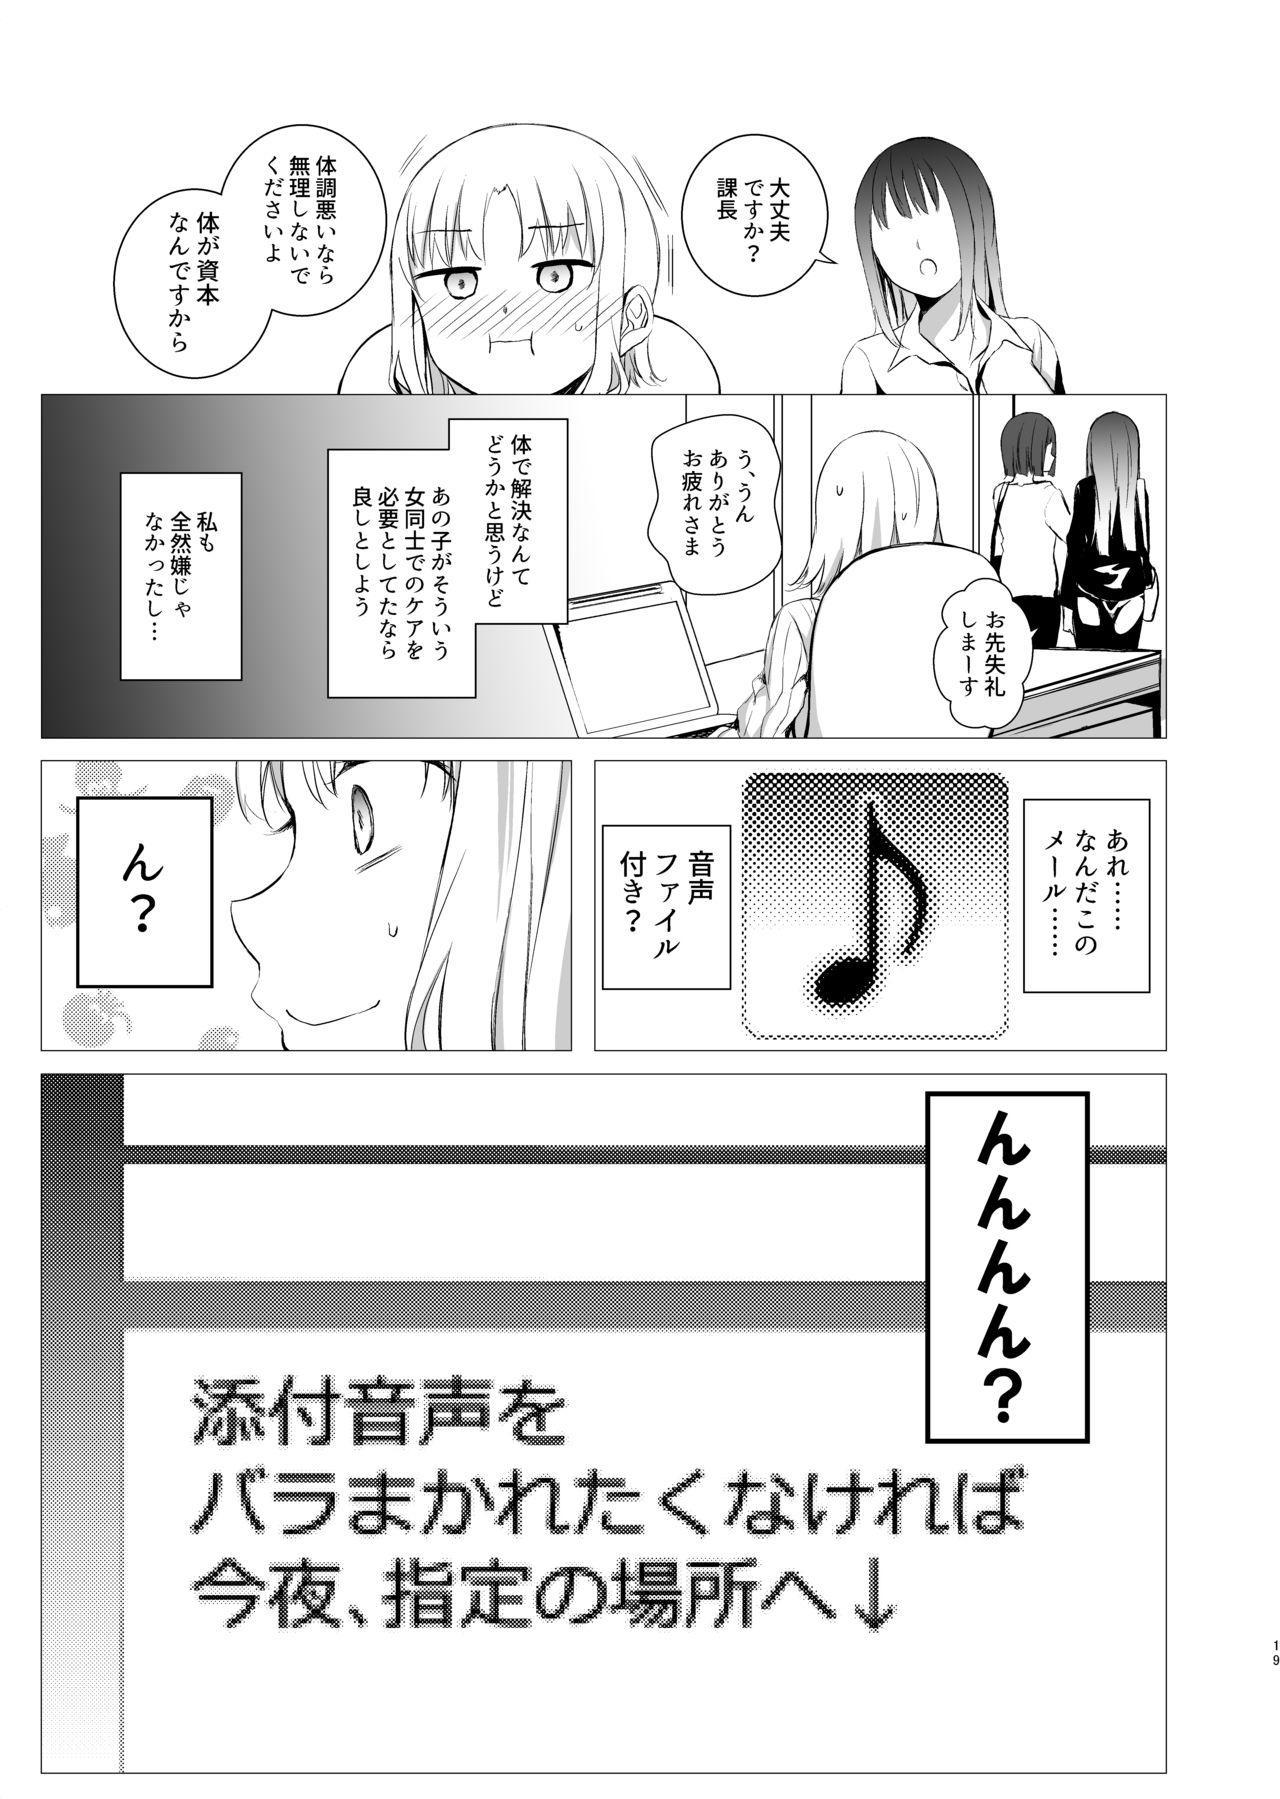 Hanayomi no Makurakotoba 17